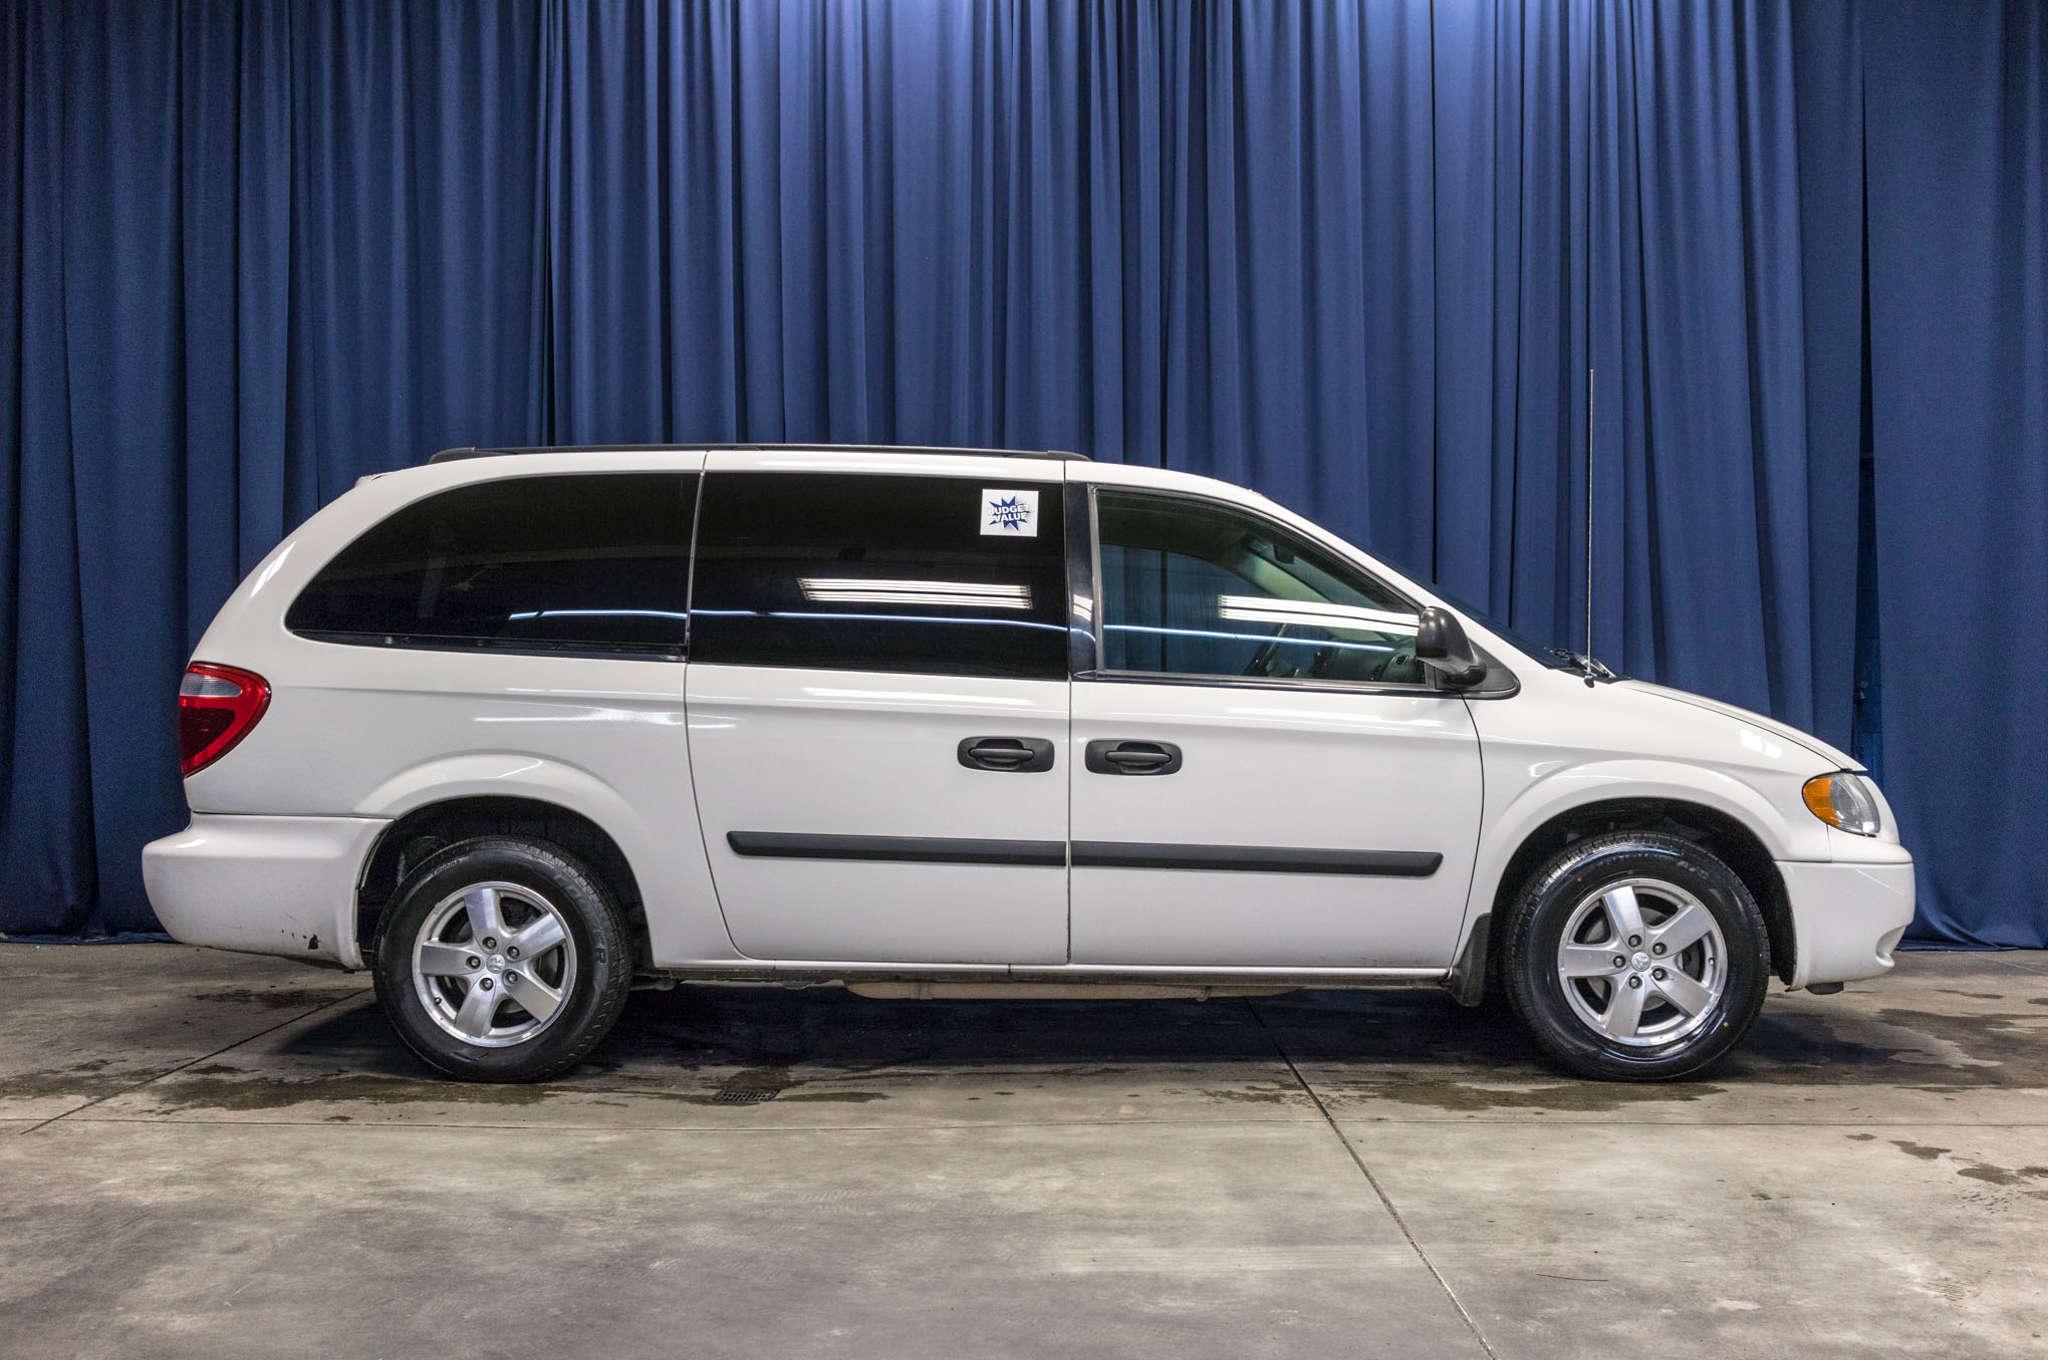 Used 2005 Dodge Grand Caravan SE FWD Minivan Van For Sale A